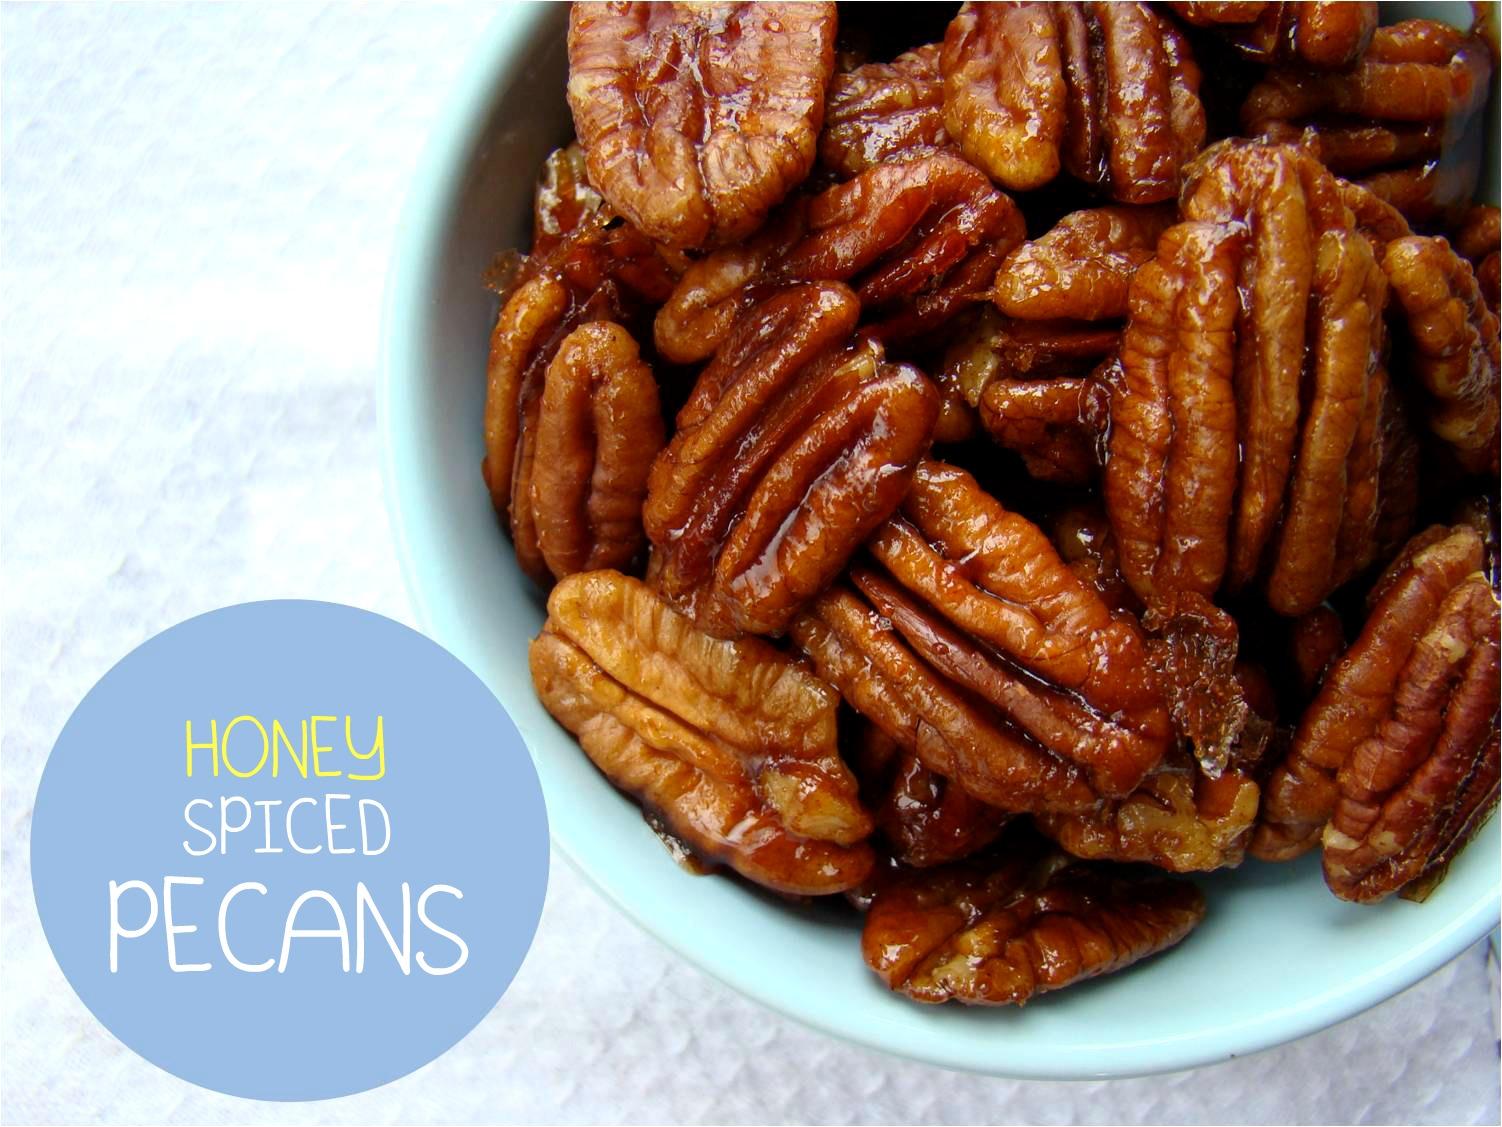 Family Feedbag: Honey spiced pecans